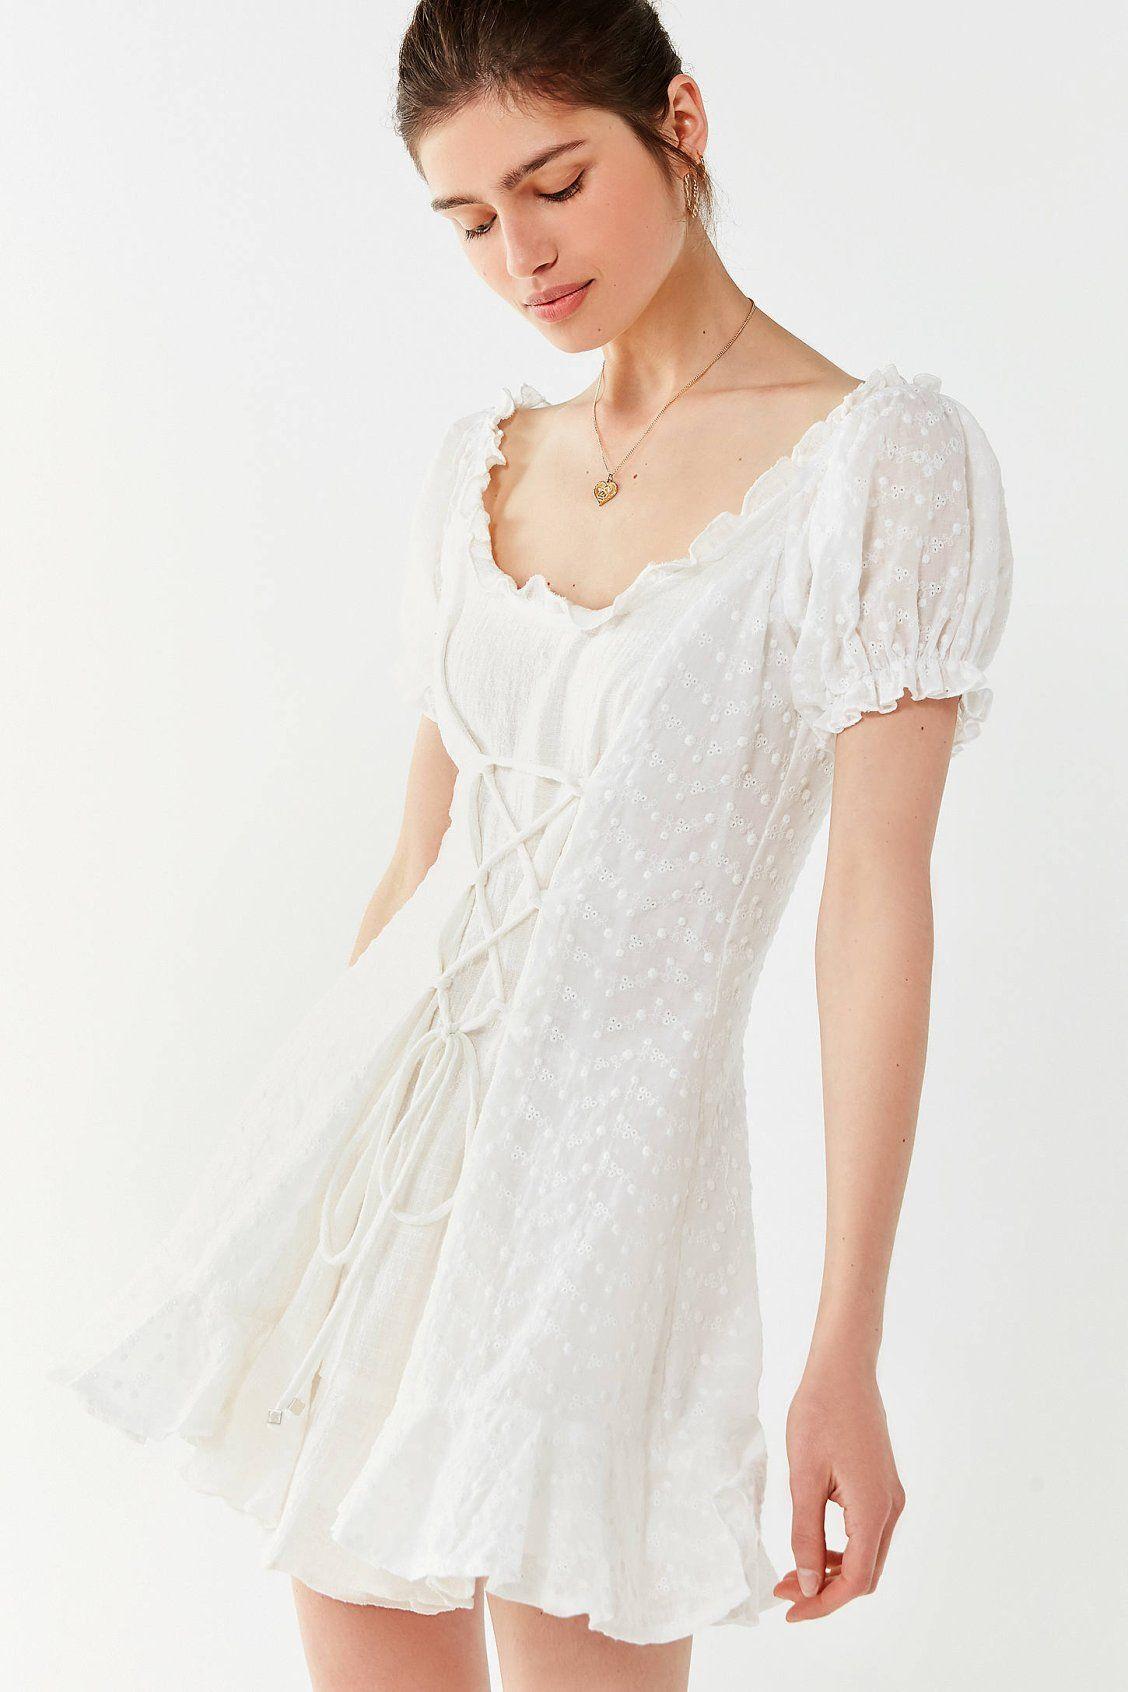 Lioness The Goldie Lace Up Eyelet Dress Dresses Lace White Dress Urban Dresses [ 1692 x 1128 Pixel ]